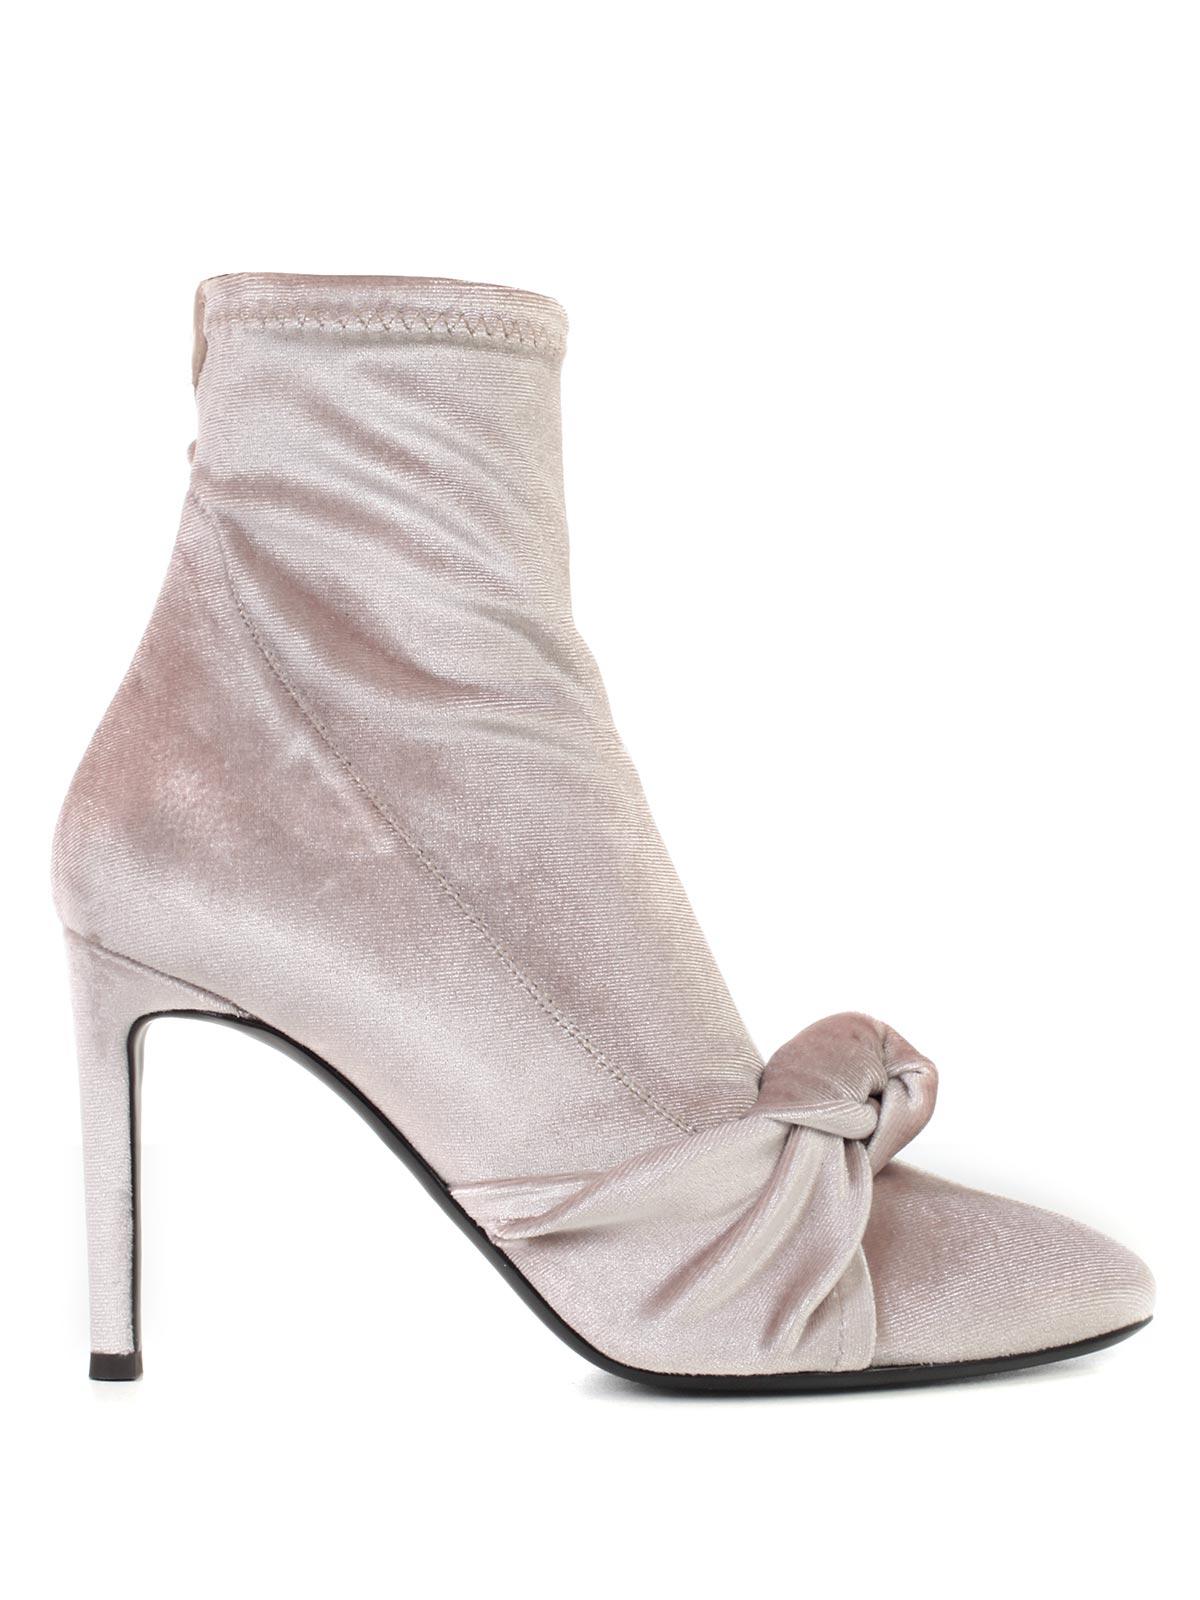 Picture of GIUSEPPE ZANOTTI Boots